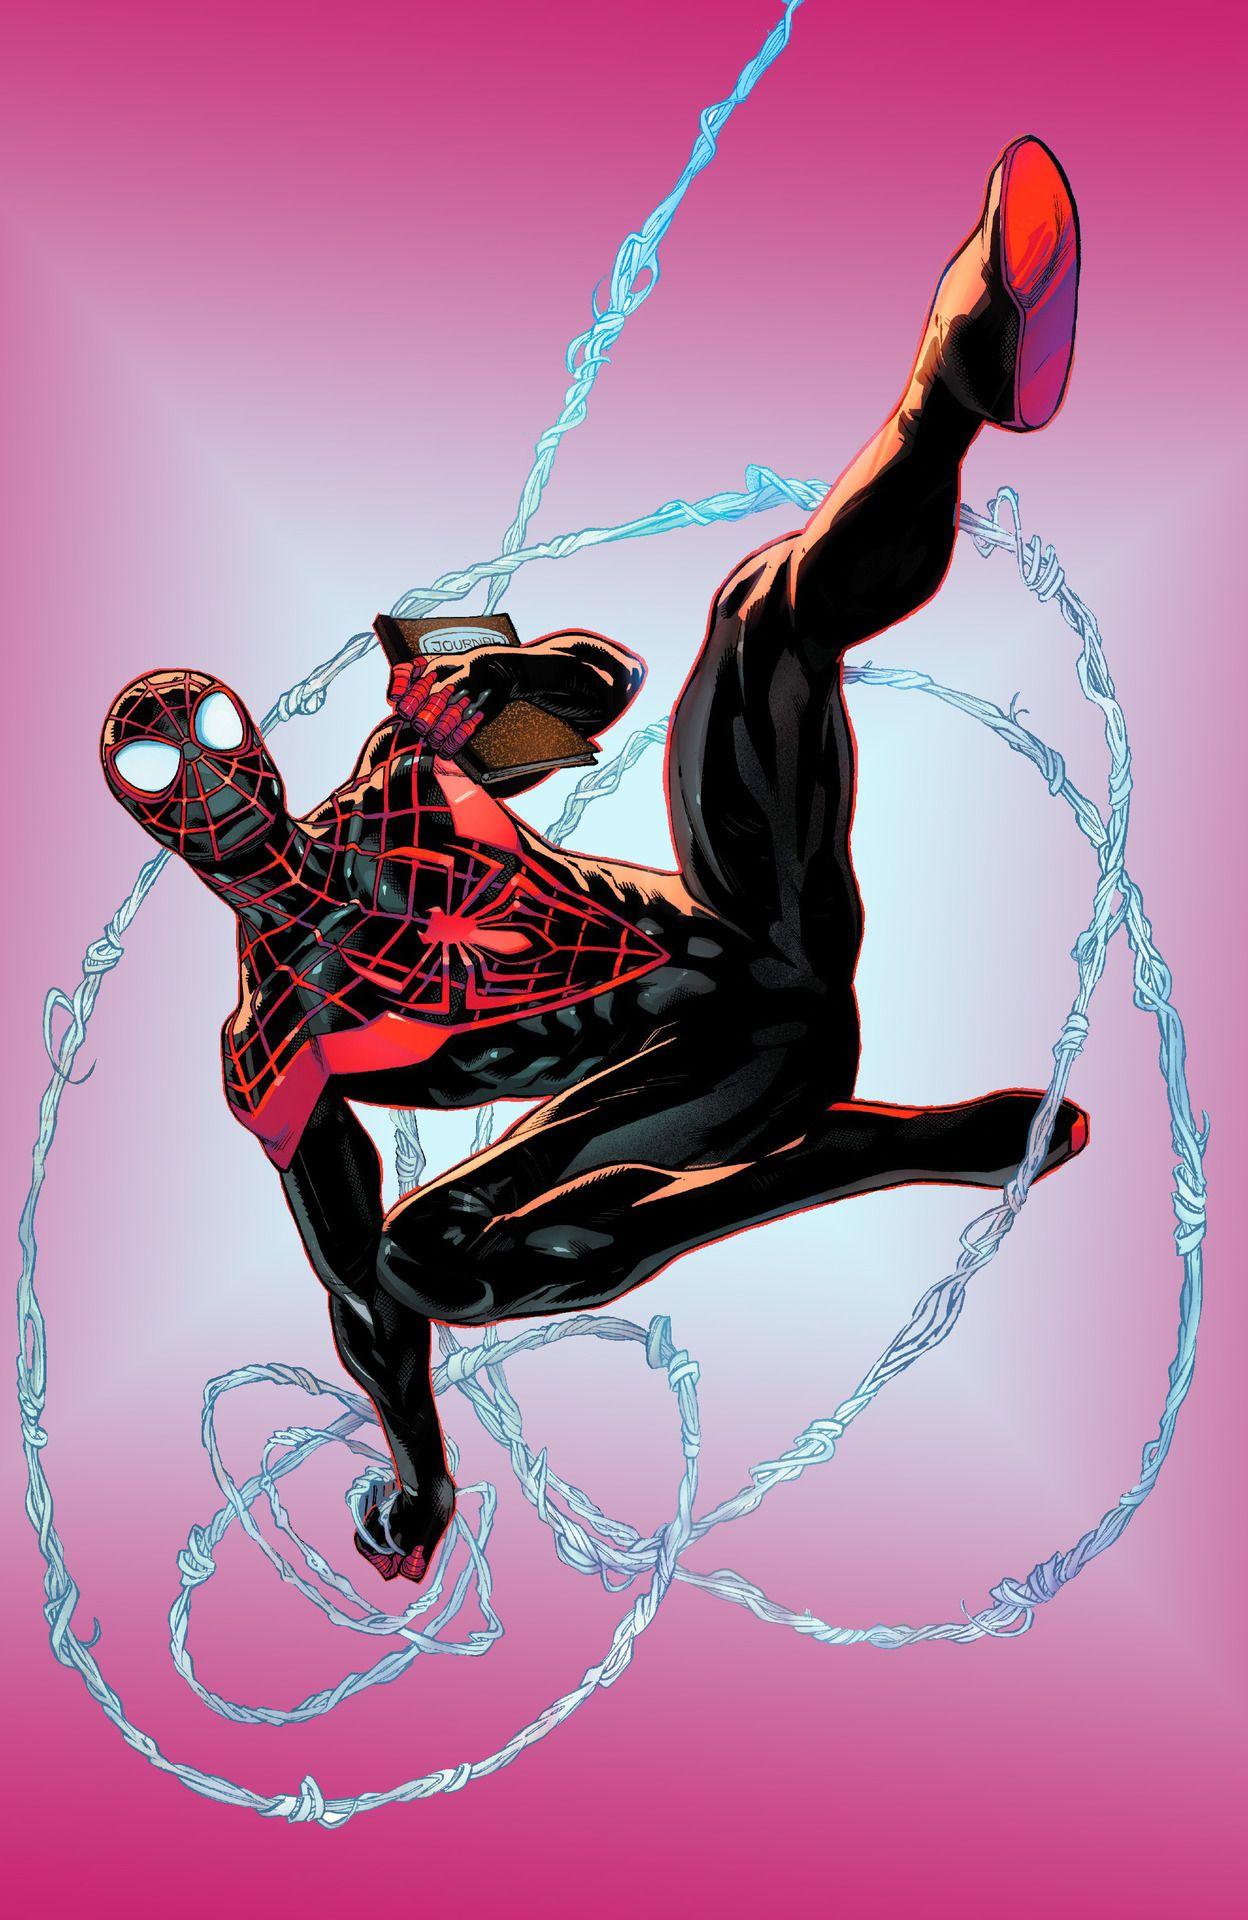 Miles morales is the best spiderman drawing spiderman